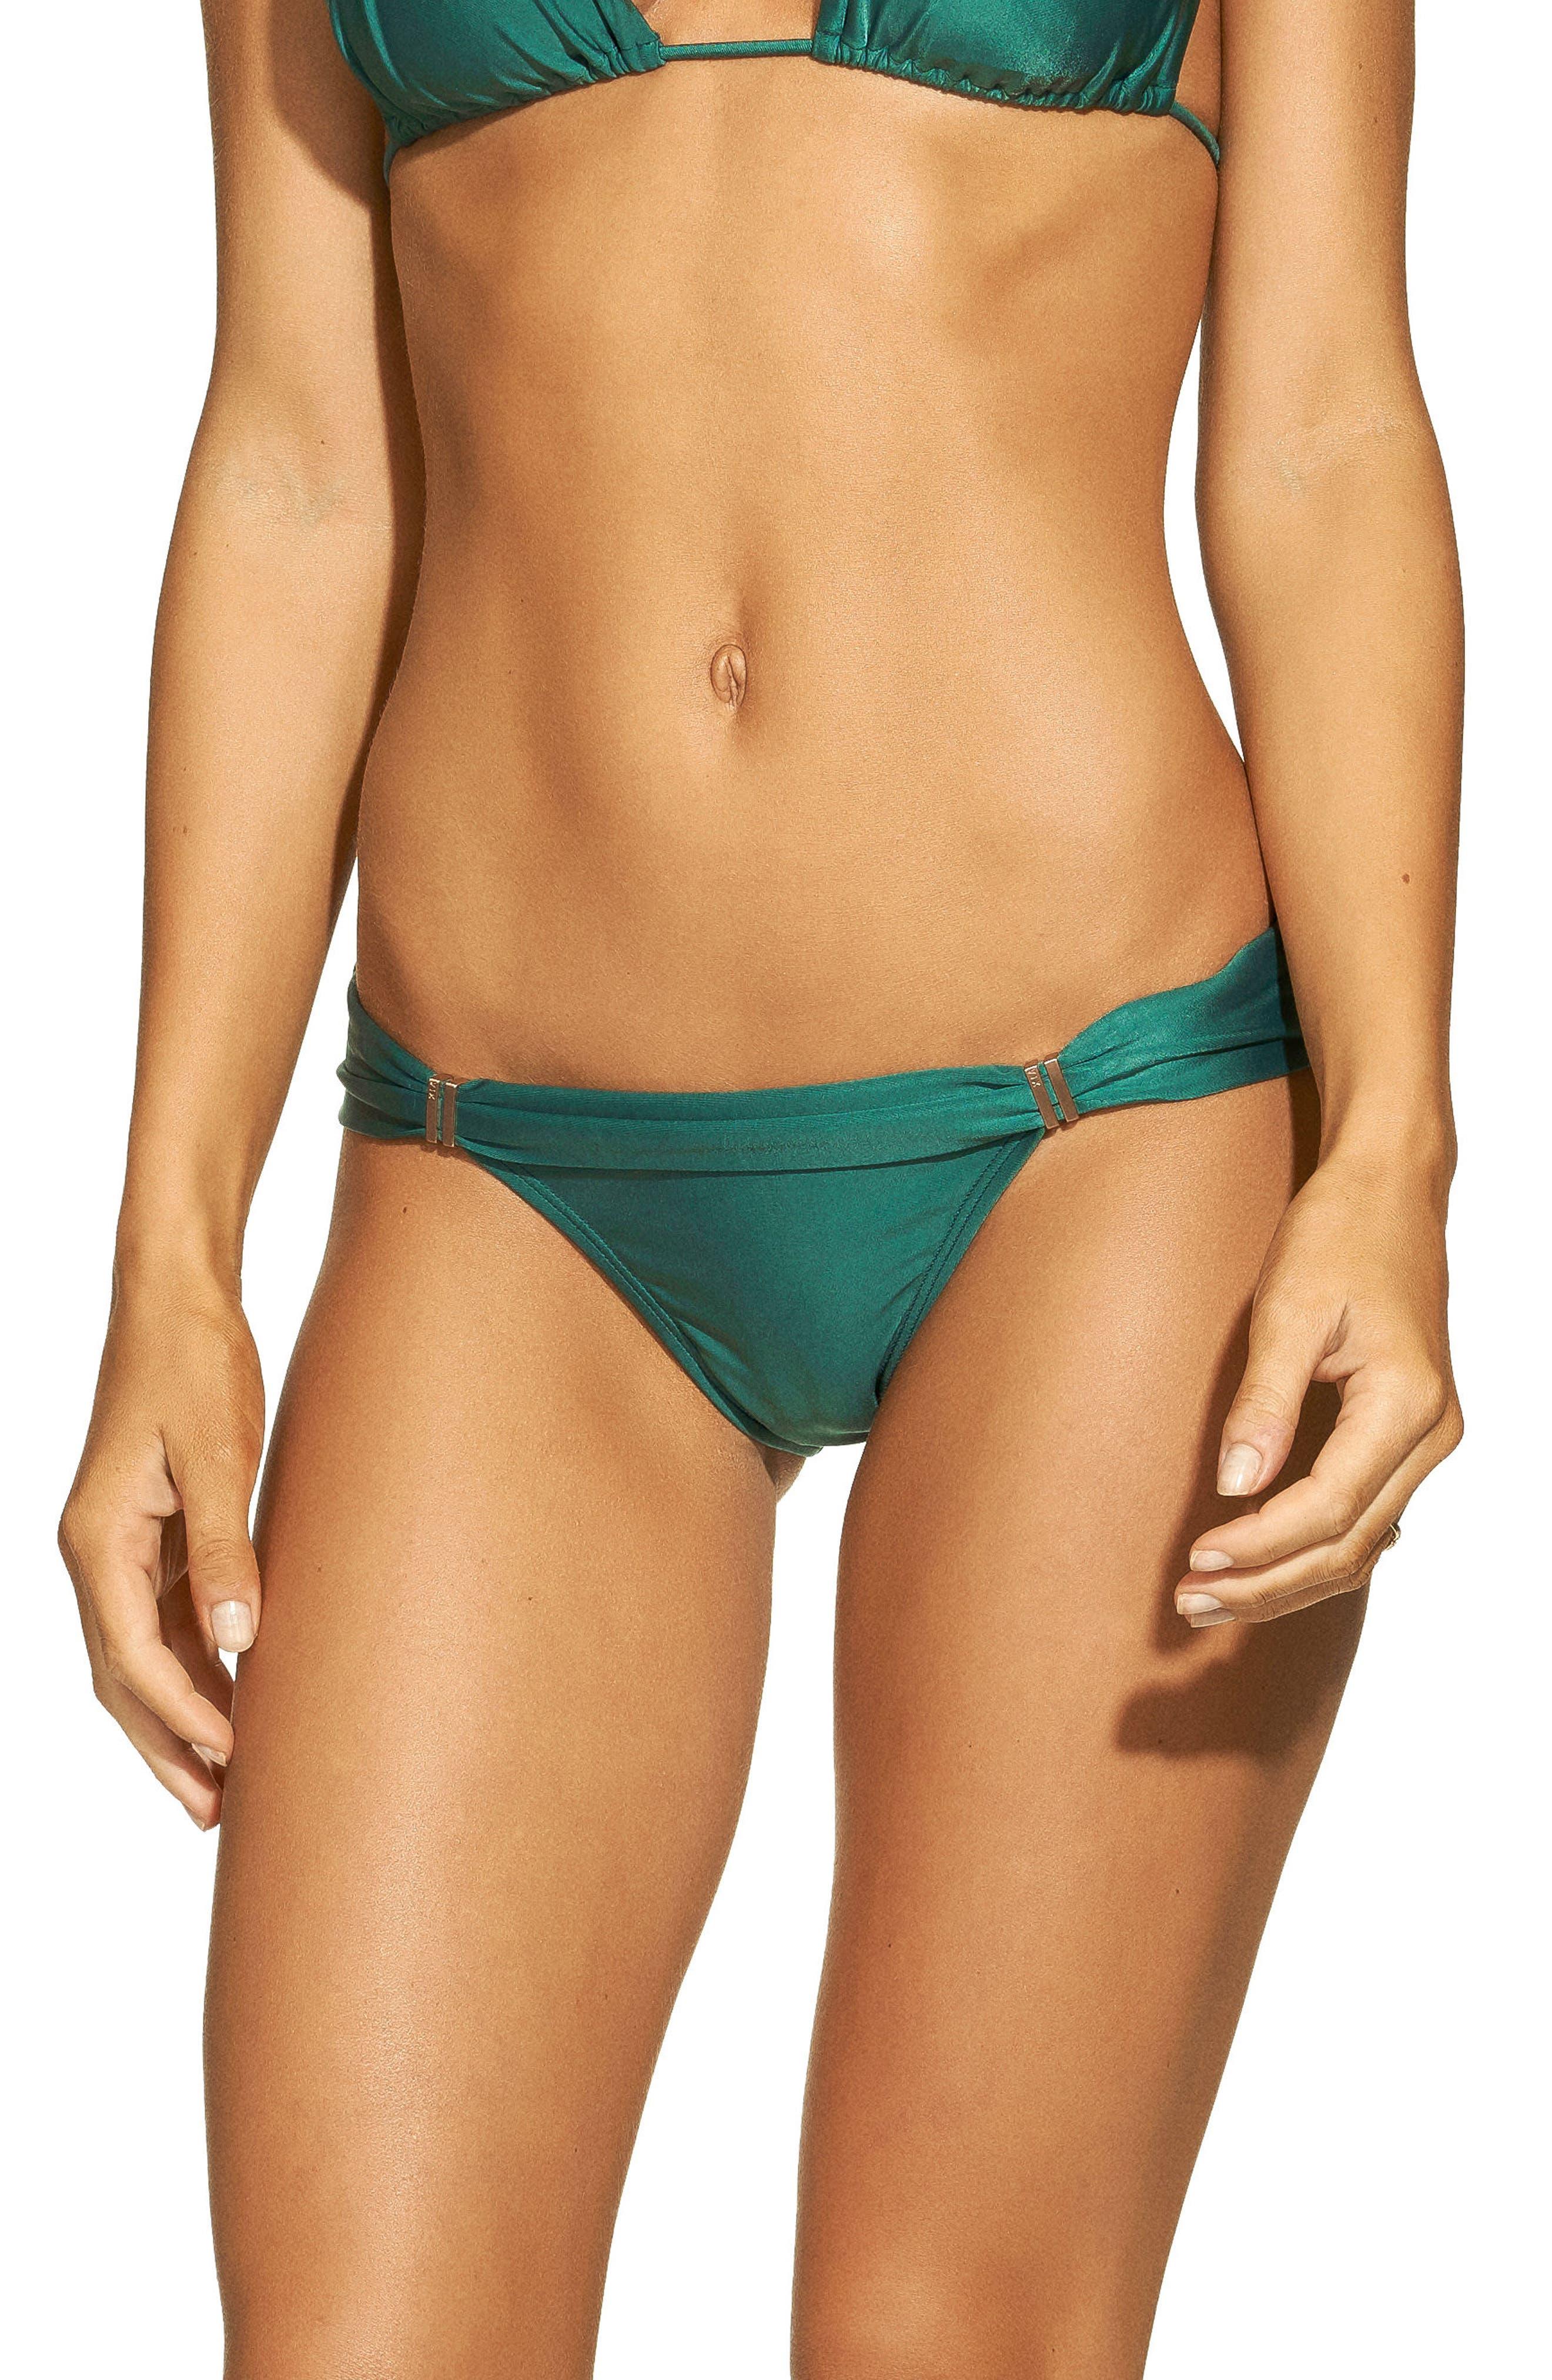 Jasper Bia Bikini Bottoms,                             Main thumbnail 1, color,                             GREEN